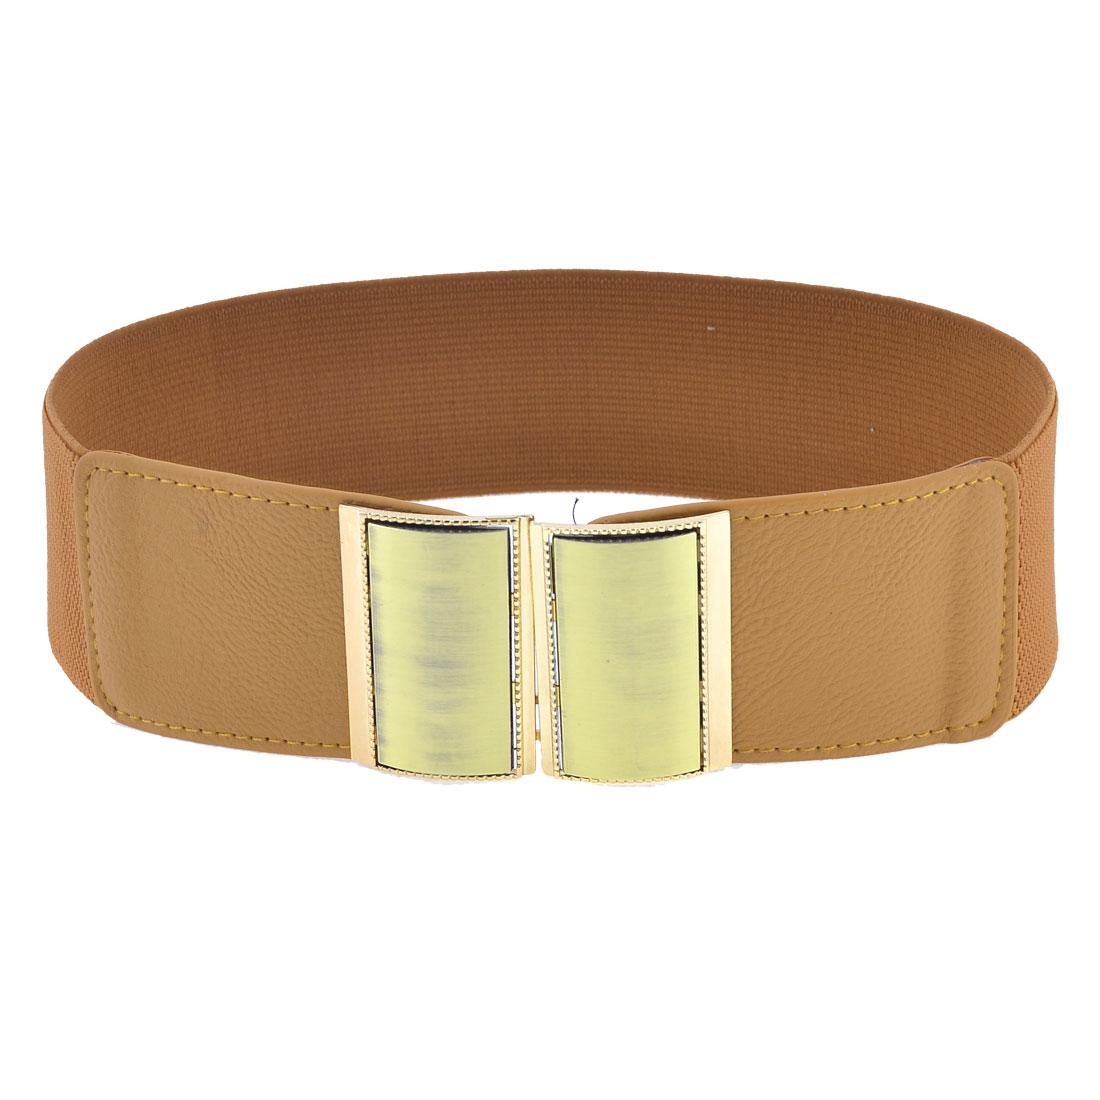 Woman Gold Tone Rectangle Interlocking Buckle Decor Cinch Waist Belt Band Brown